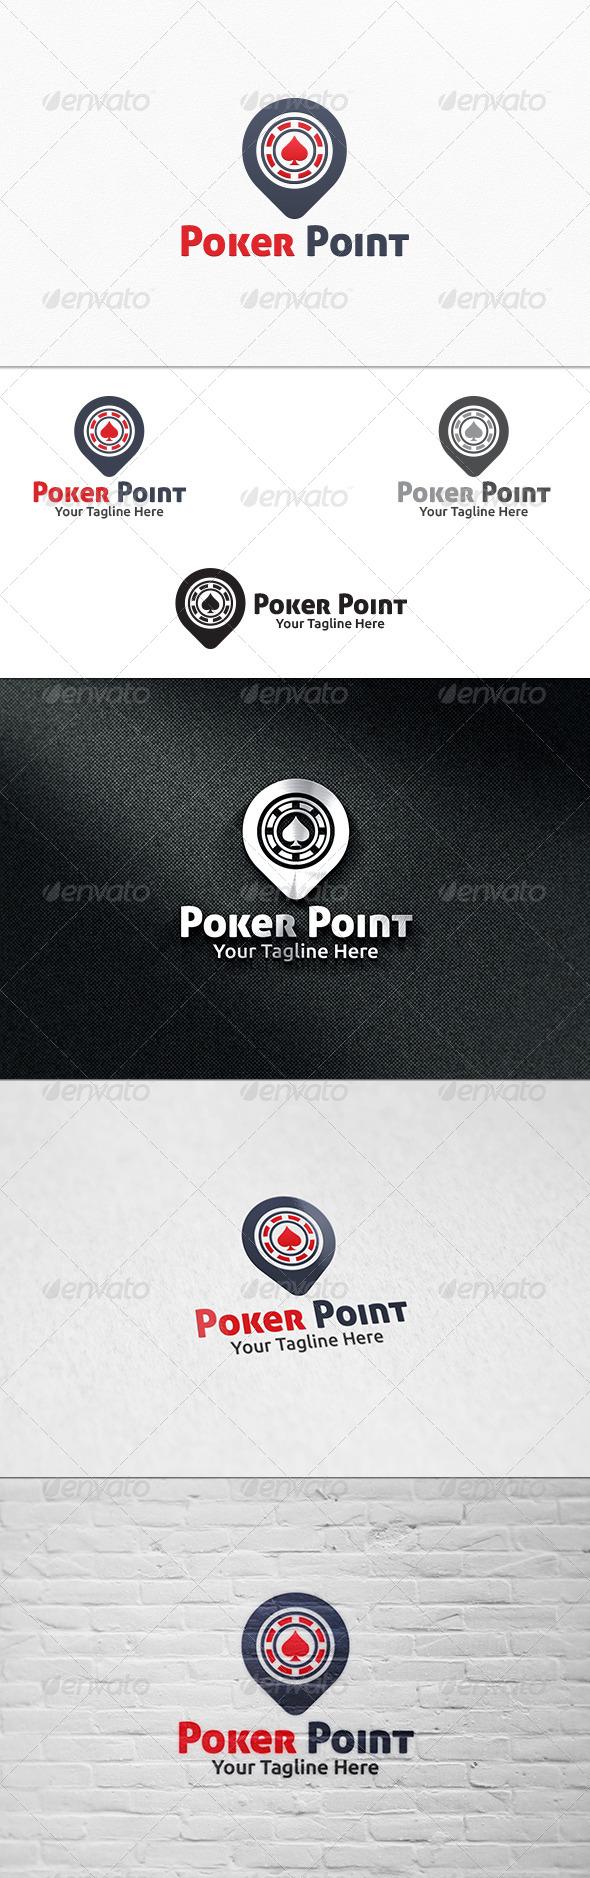 Poker Point - Logo Template